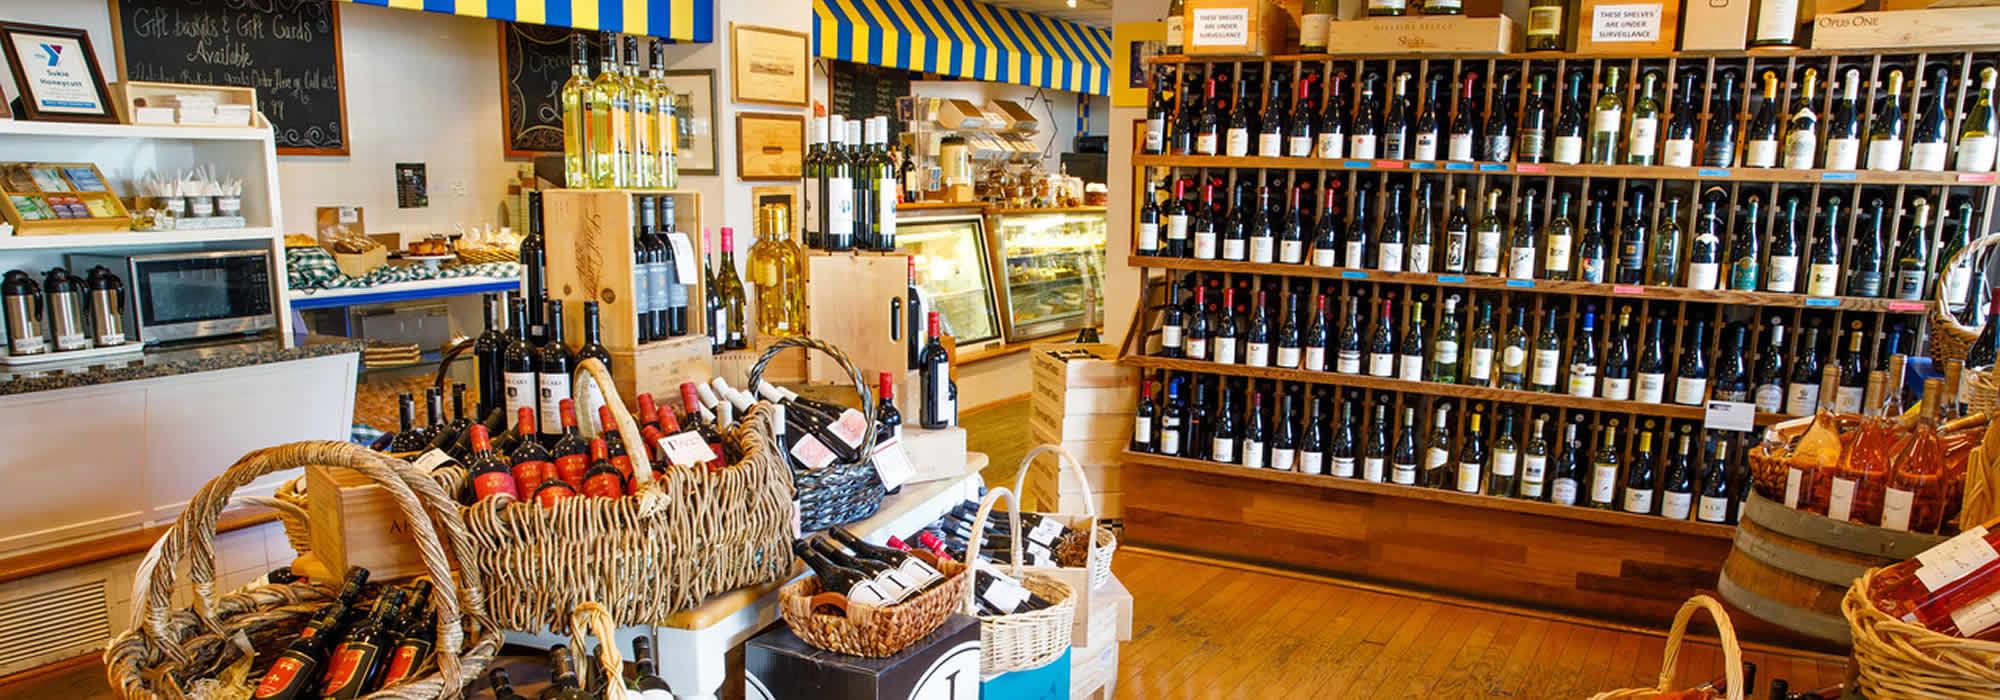 Wine Shop at Tony's Off Third